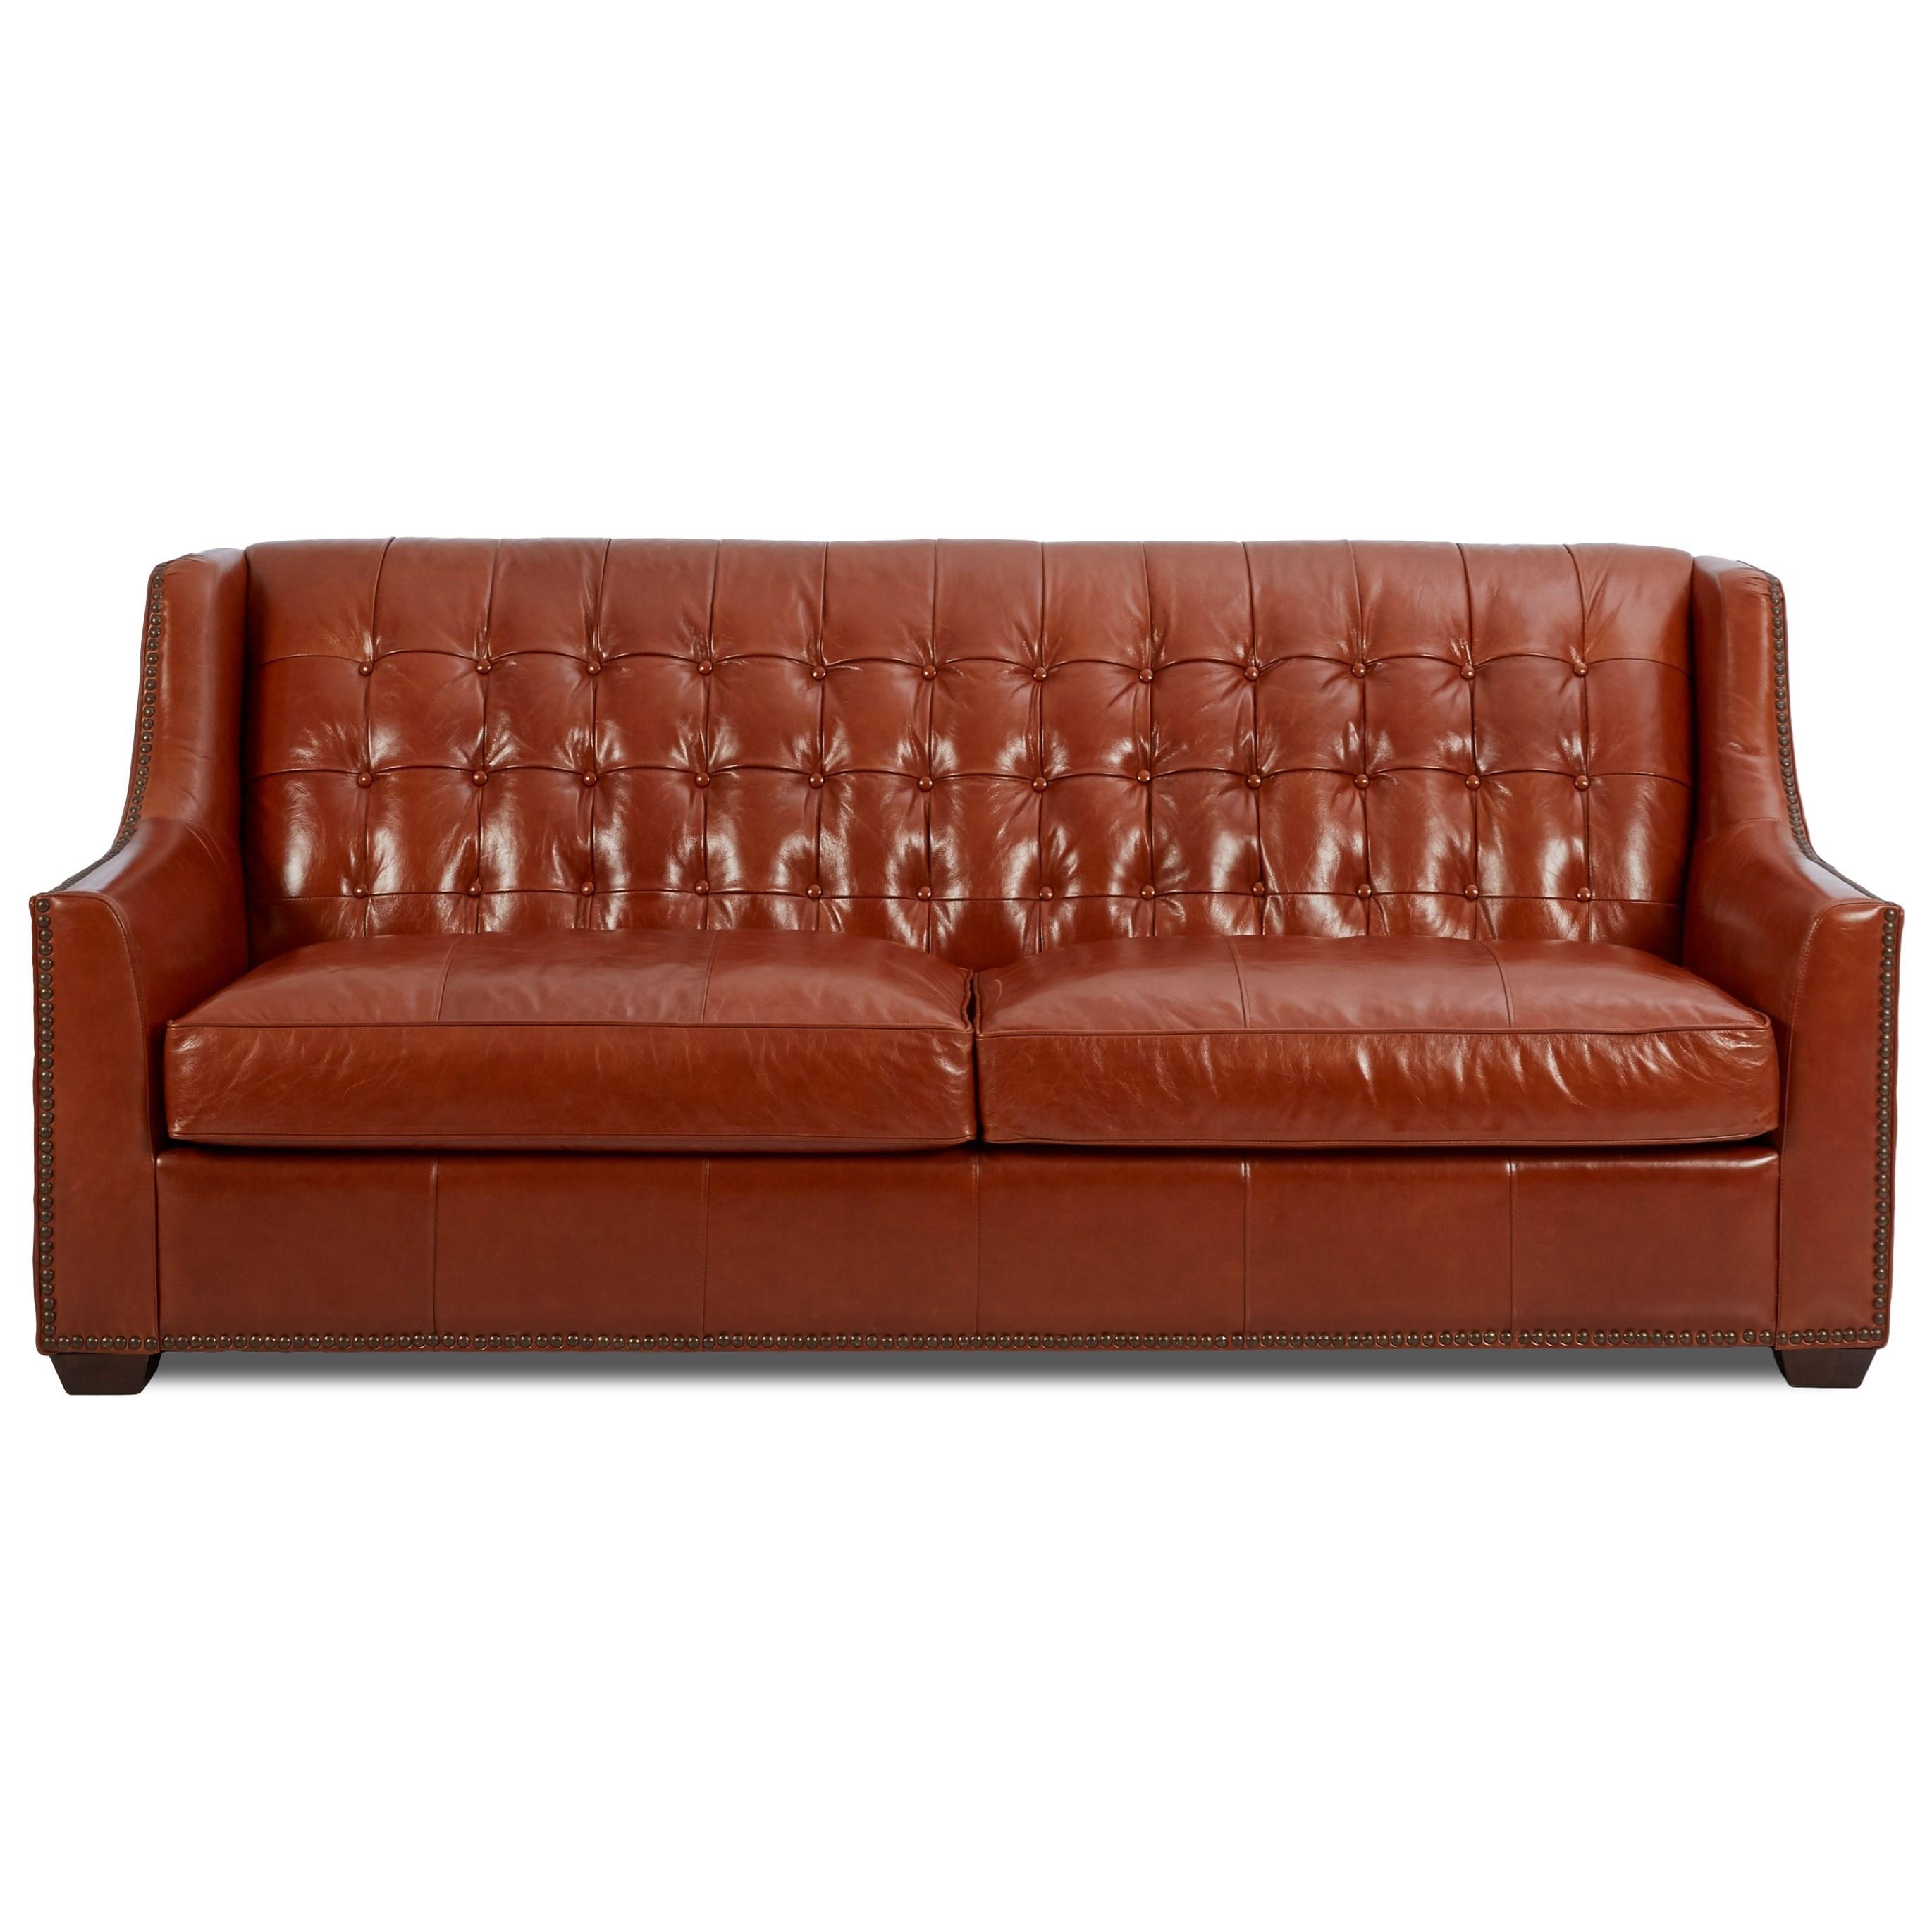 Pennington Sofa